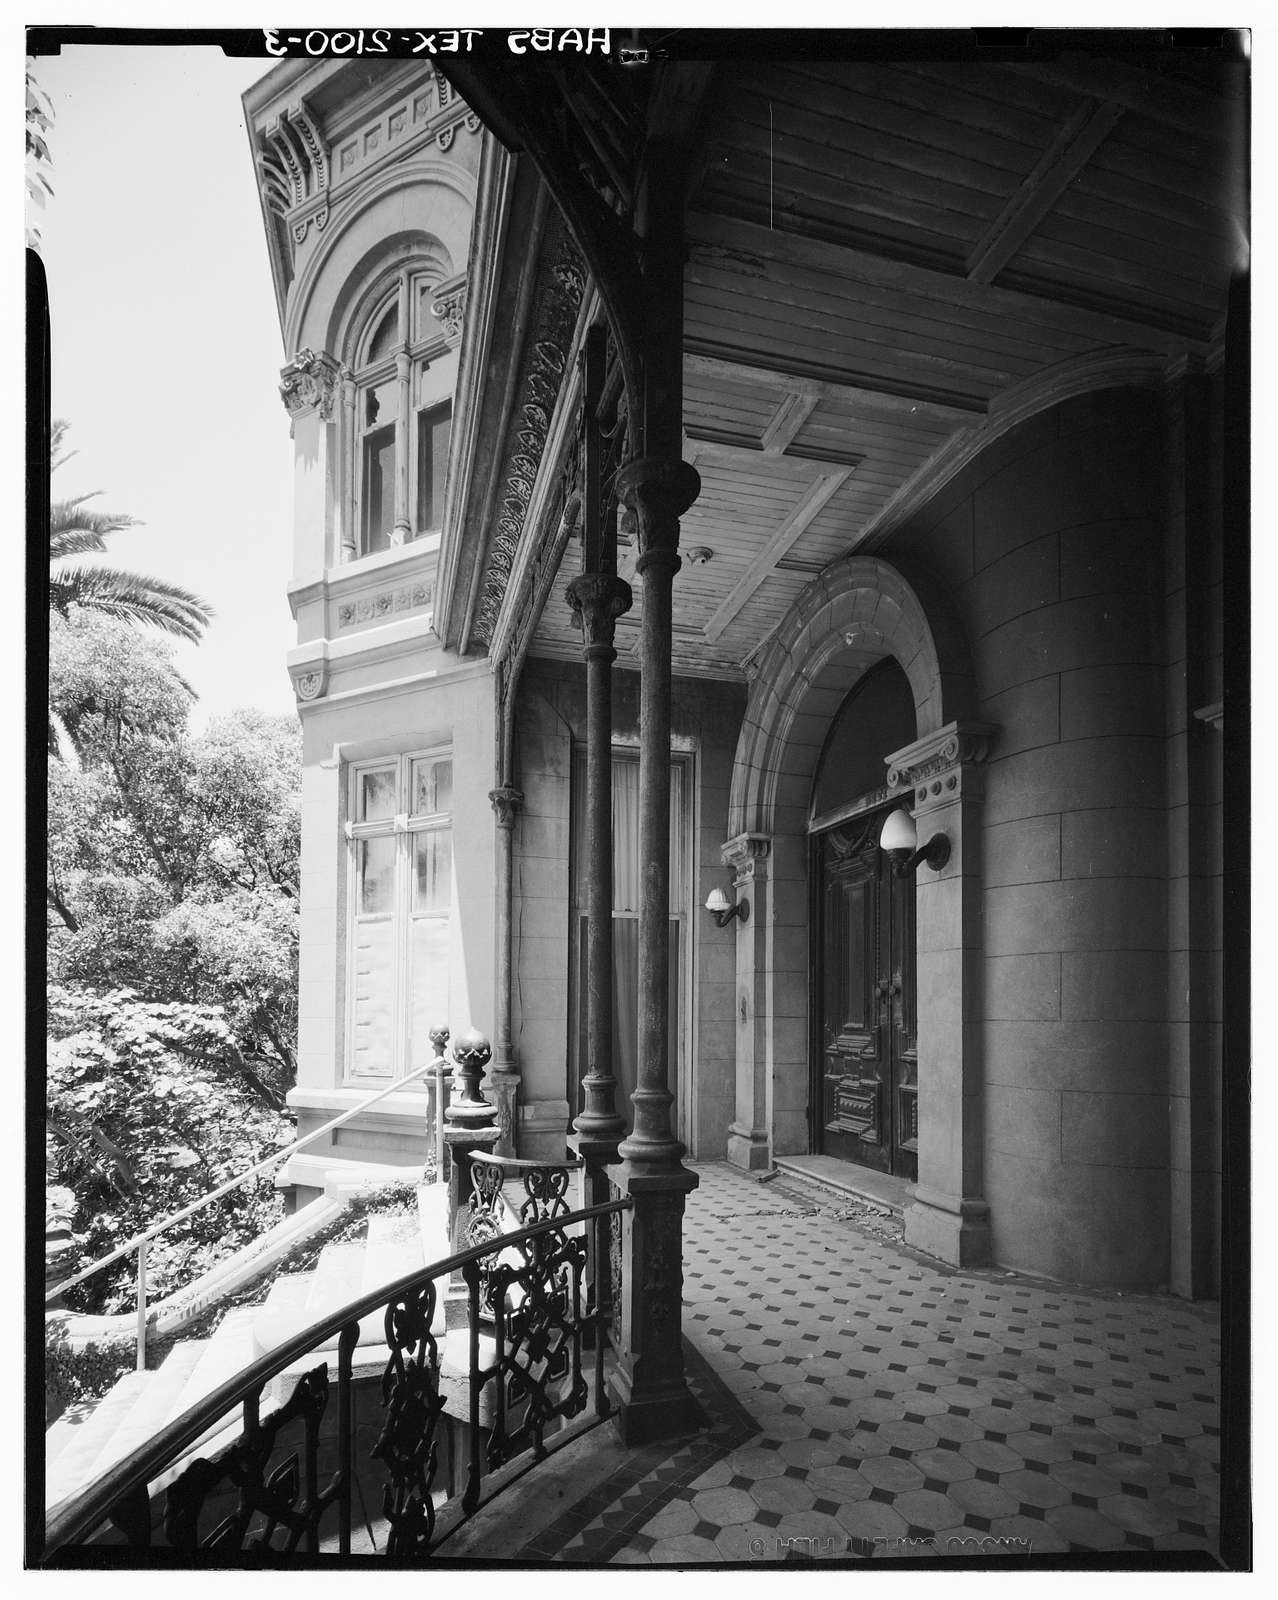 Morris Lasker House, 1718-1726 Broadway, Galveston, Galveston County, TX